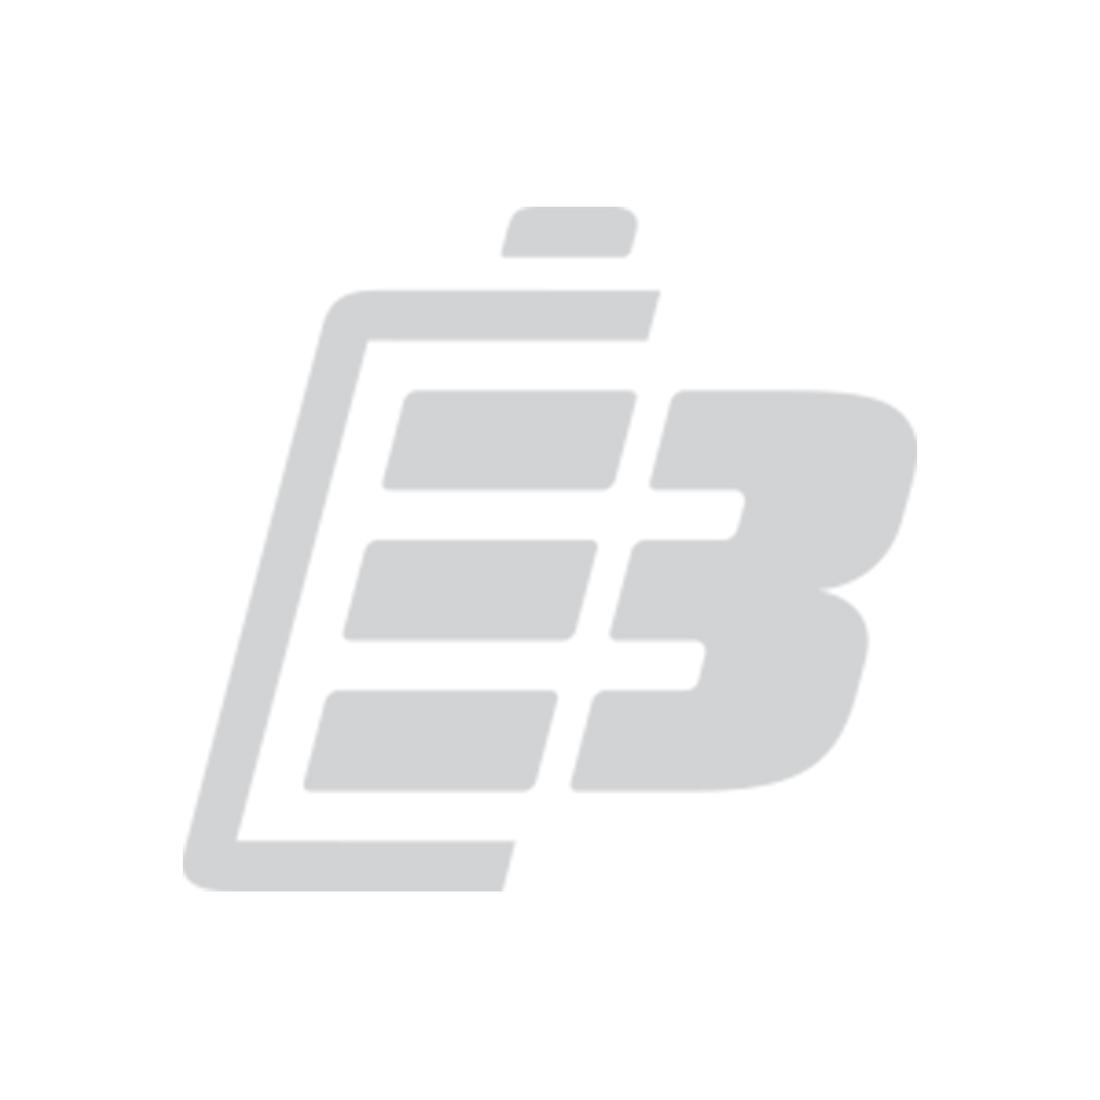 Choetech SC008 120W Foldable Solar Charger